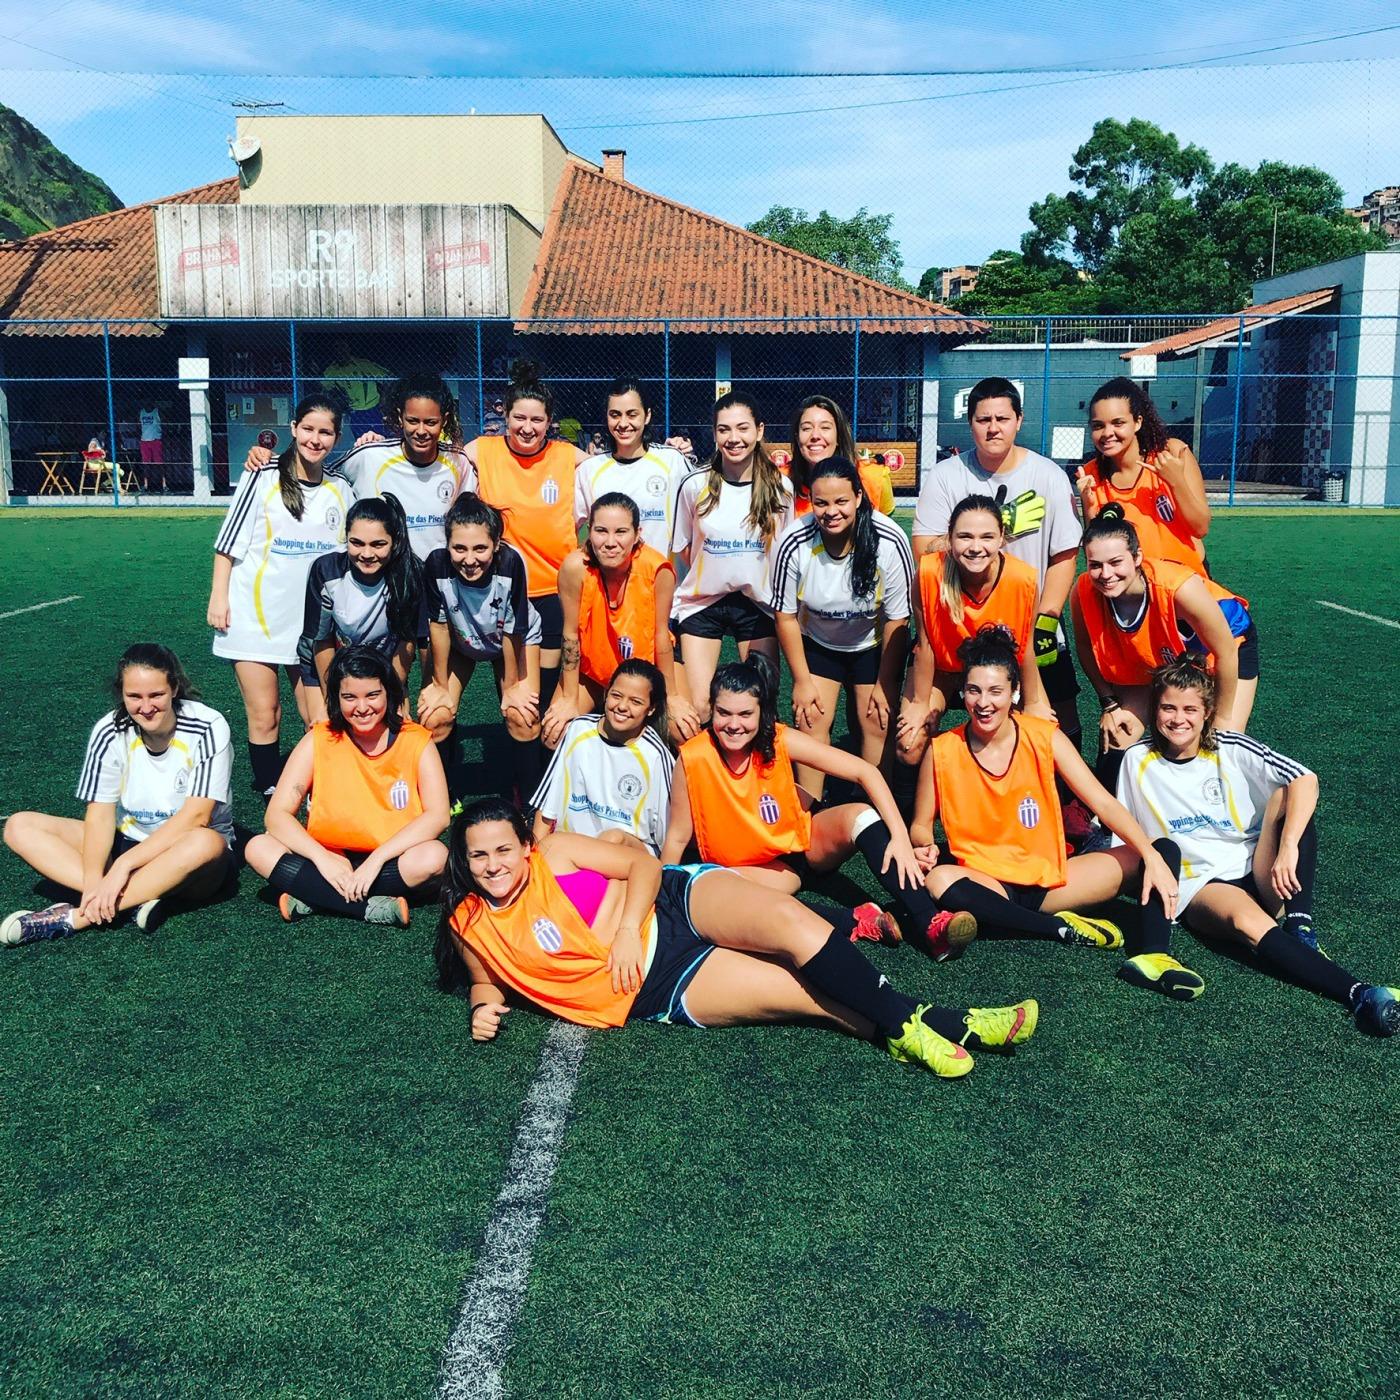 Torneio de Futebol Society Faesa 2018